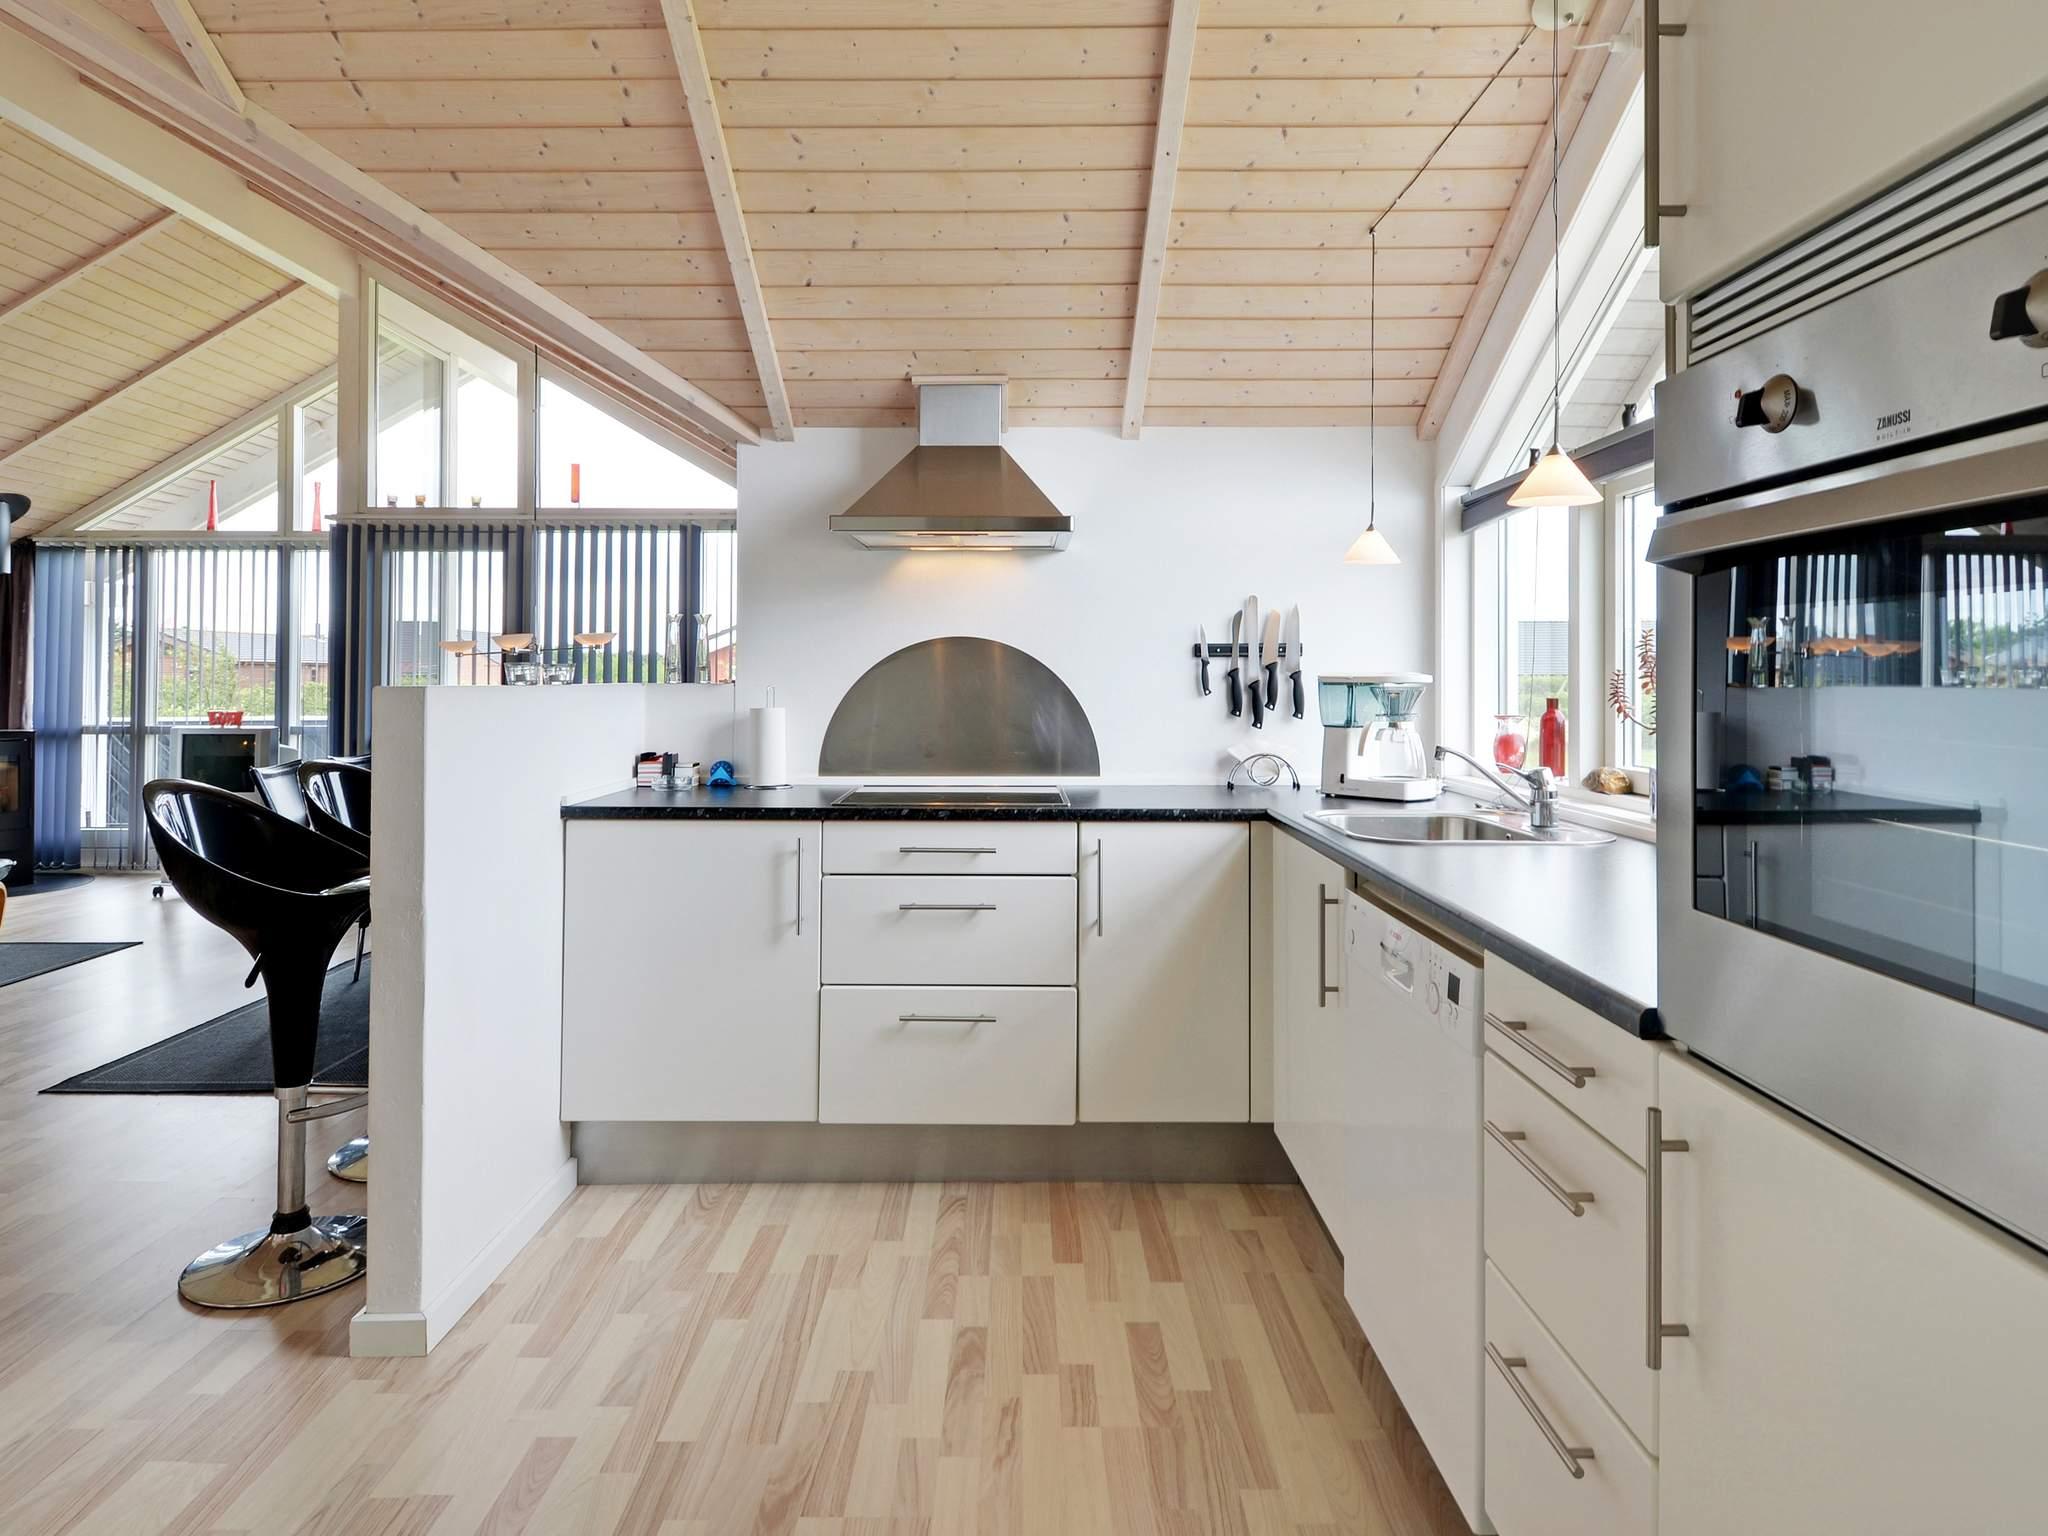 Ferienhaus Skaven Strand (160058), Tarm, , Westjütland, Dänemark, Bild 2